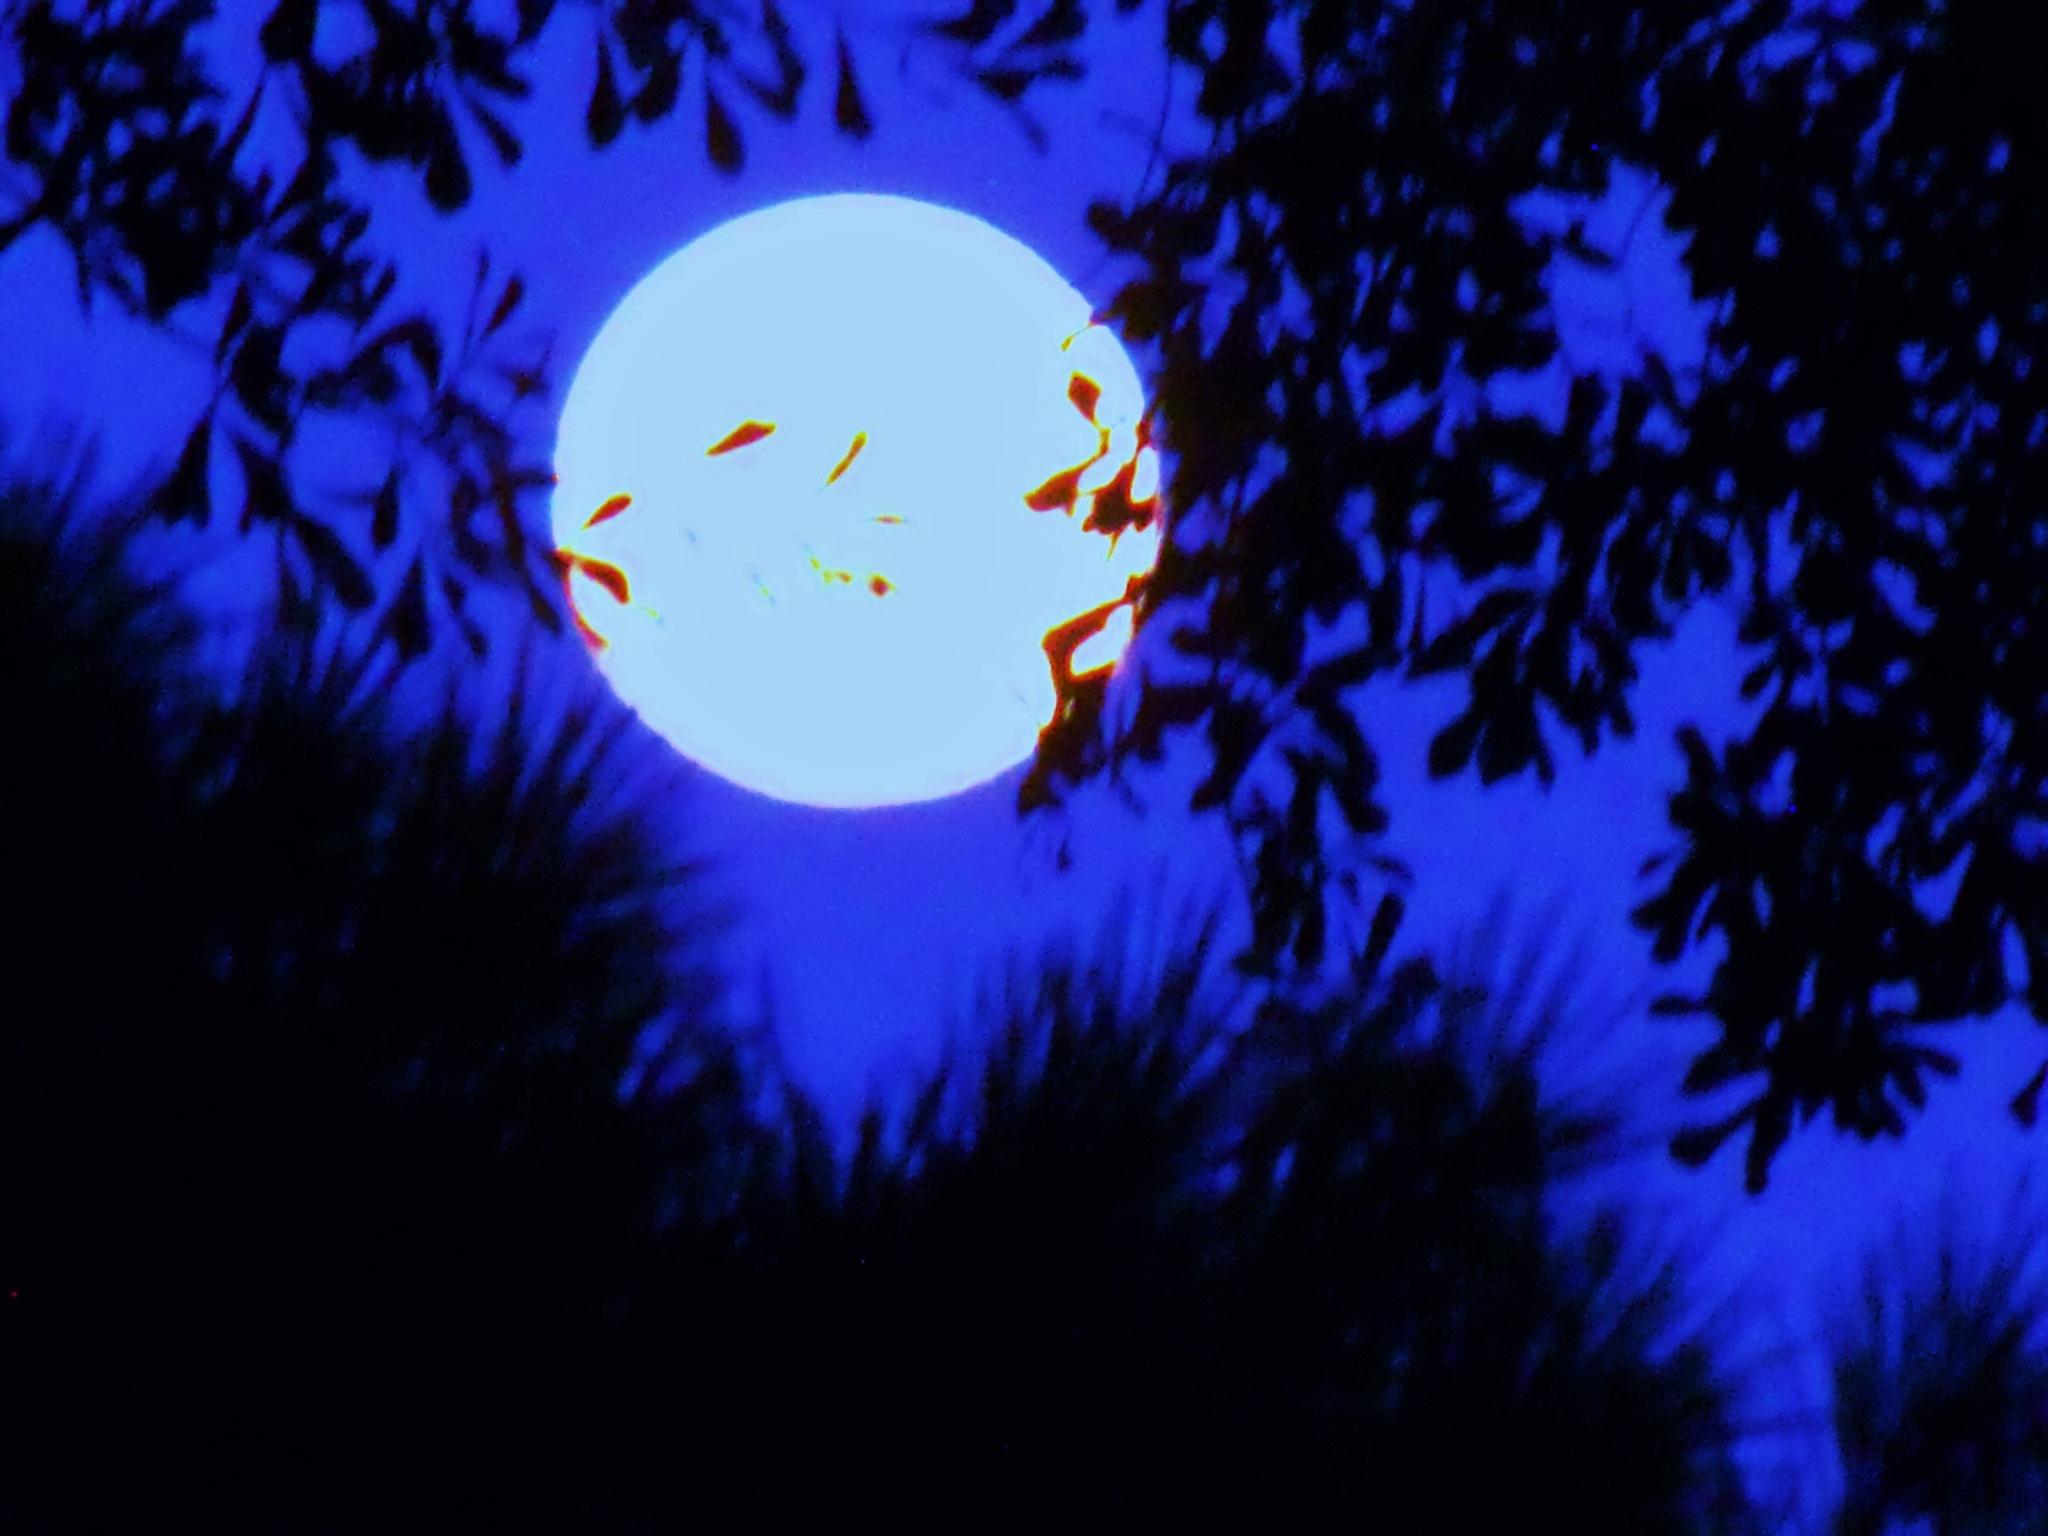 blue moon by cindi.lucas.7